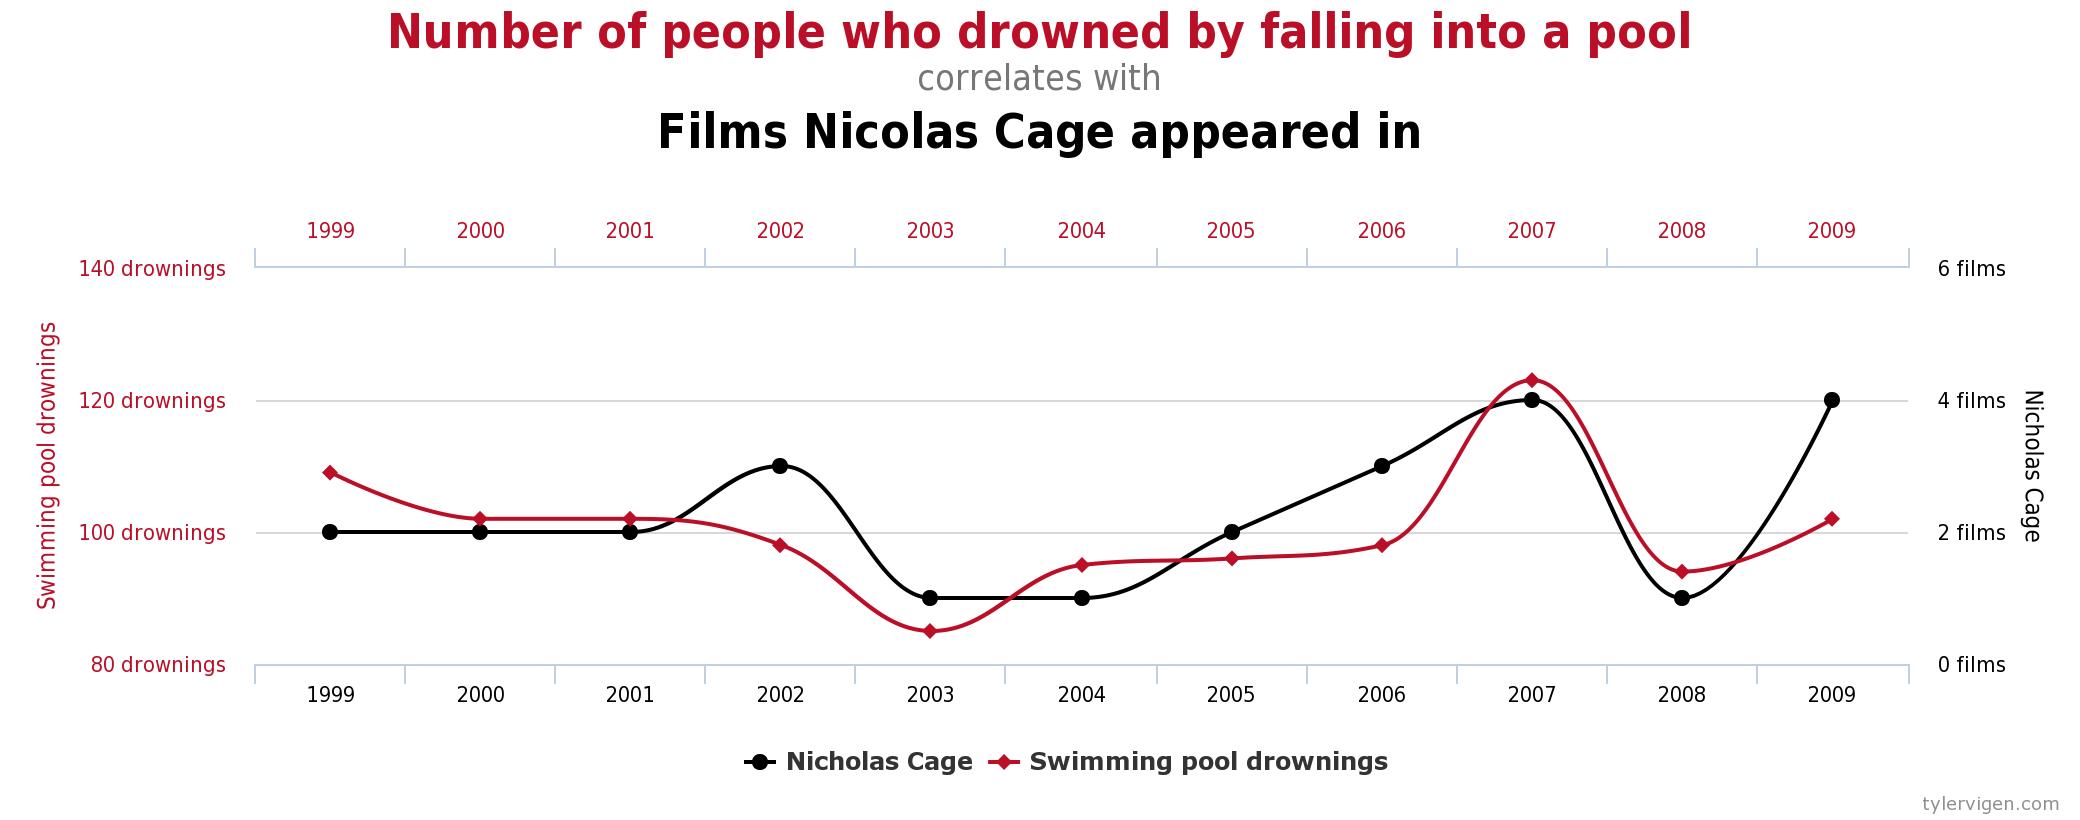 Figure 2.5 Example of a Spurious Correlation Source: http://tylervigen.com/spurious-correlations (CC-BY 4.0)